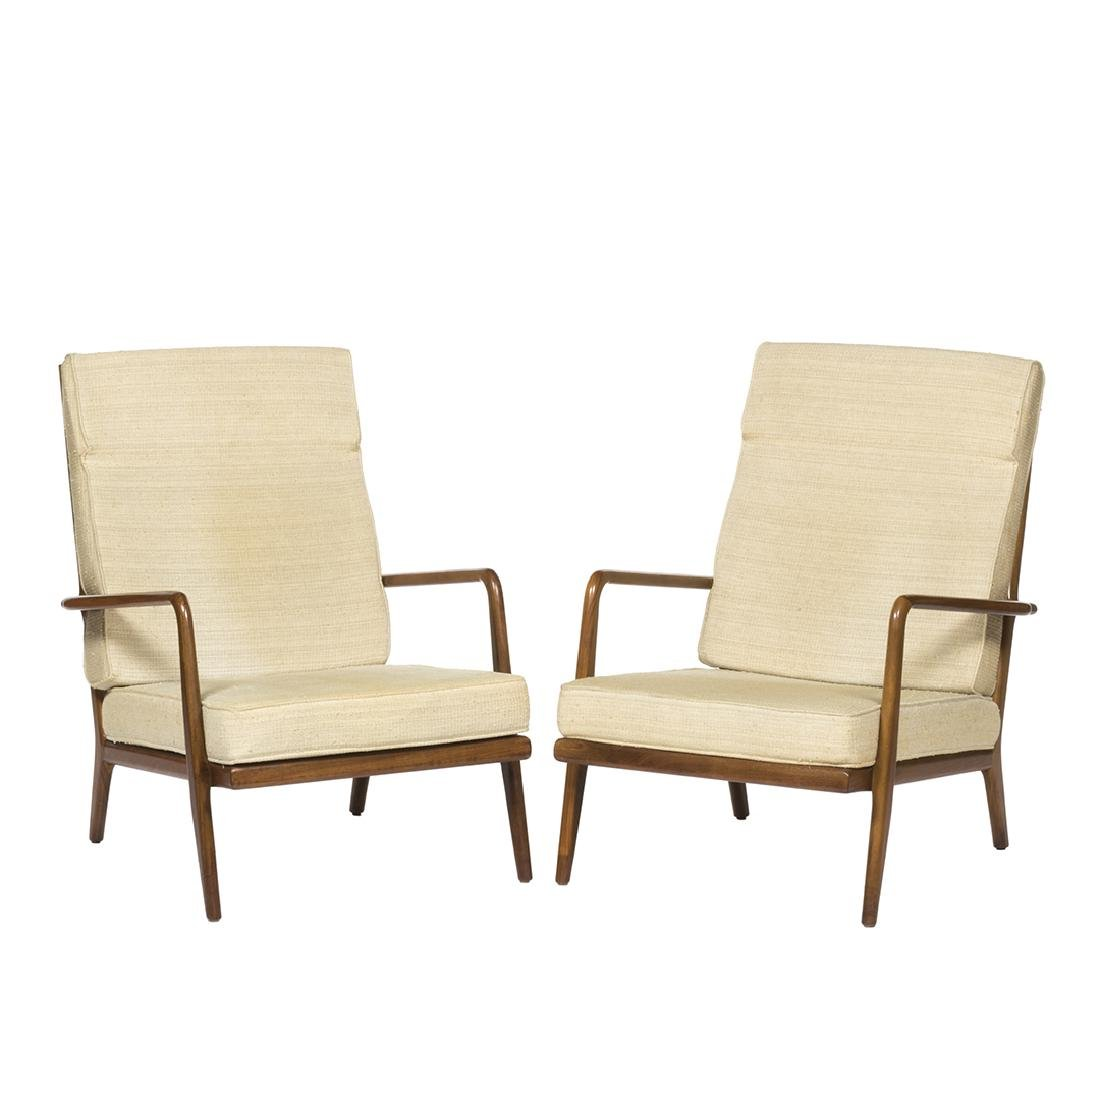 Mel Smilow Lounge Chairs (2)